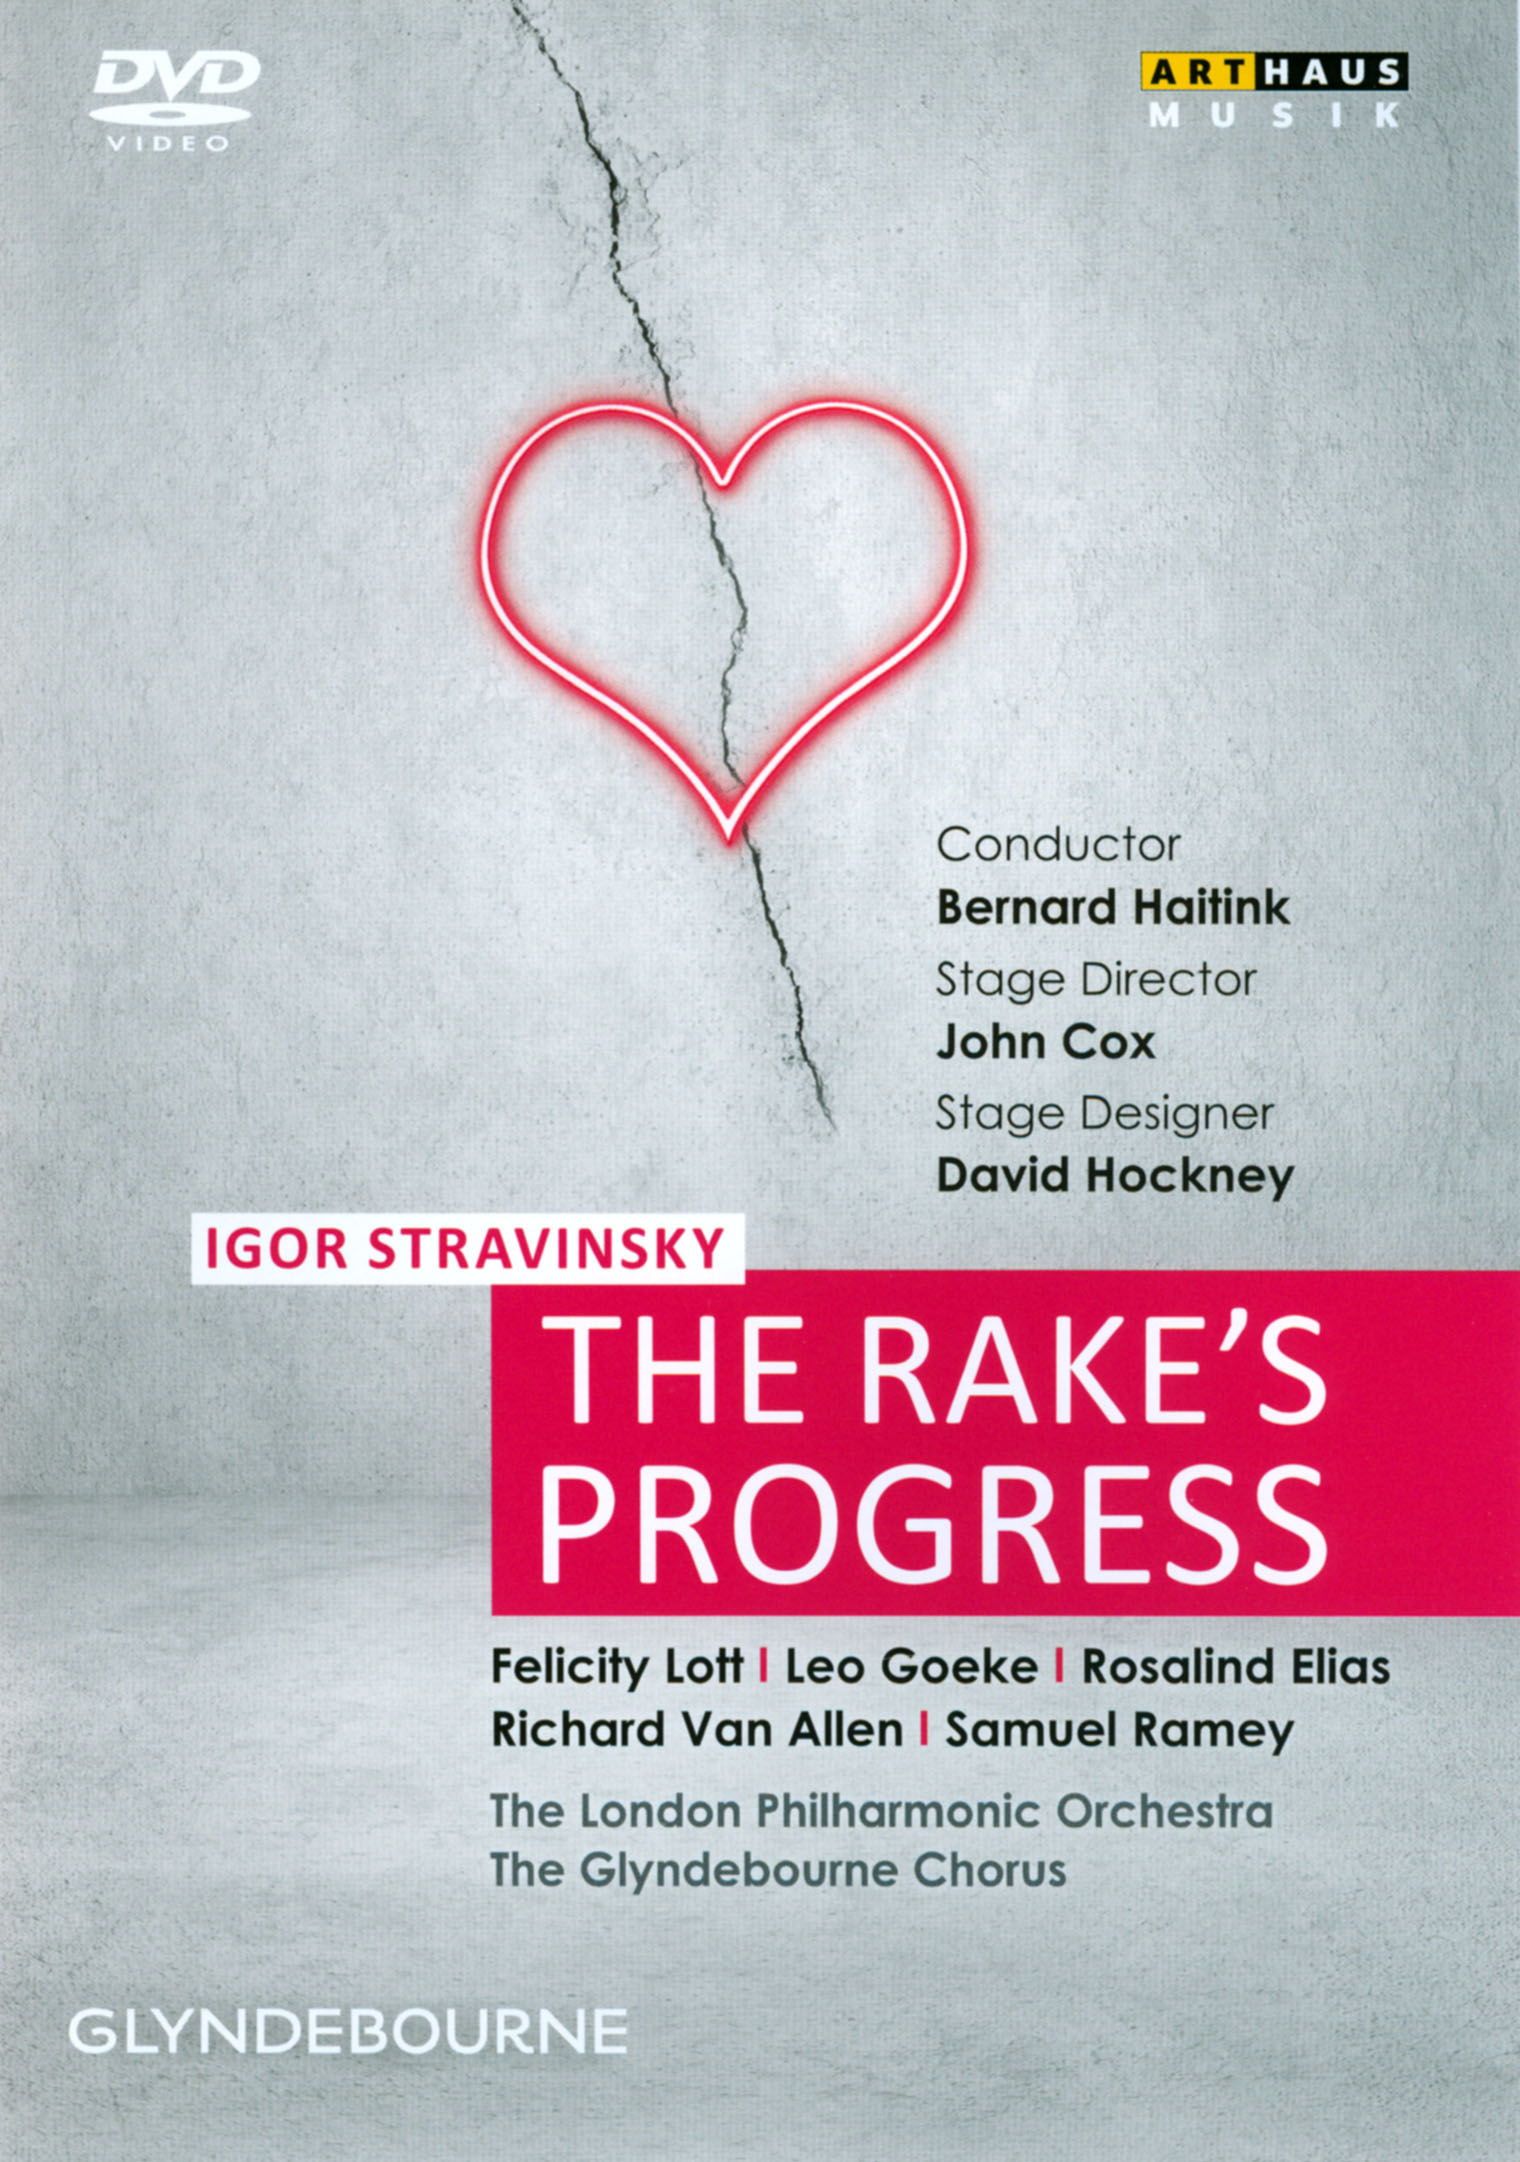 The Rake's Progress (Glyndebourne)